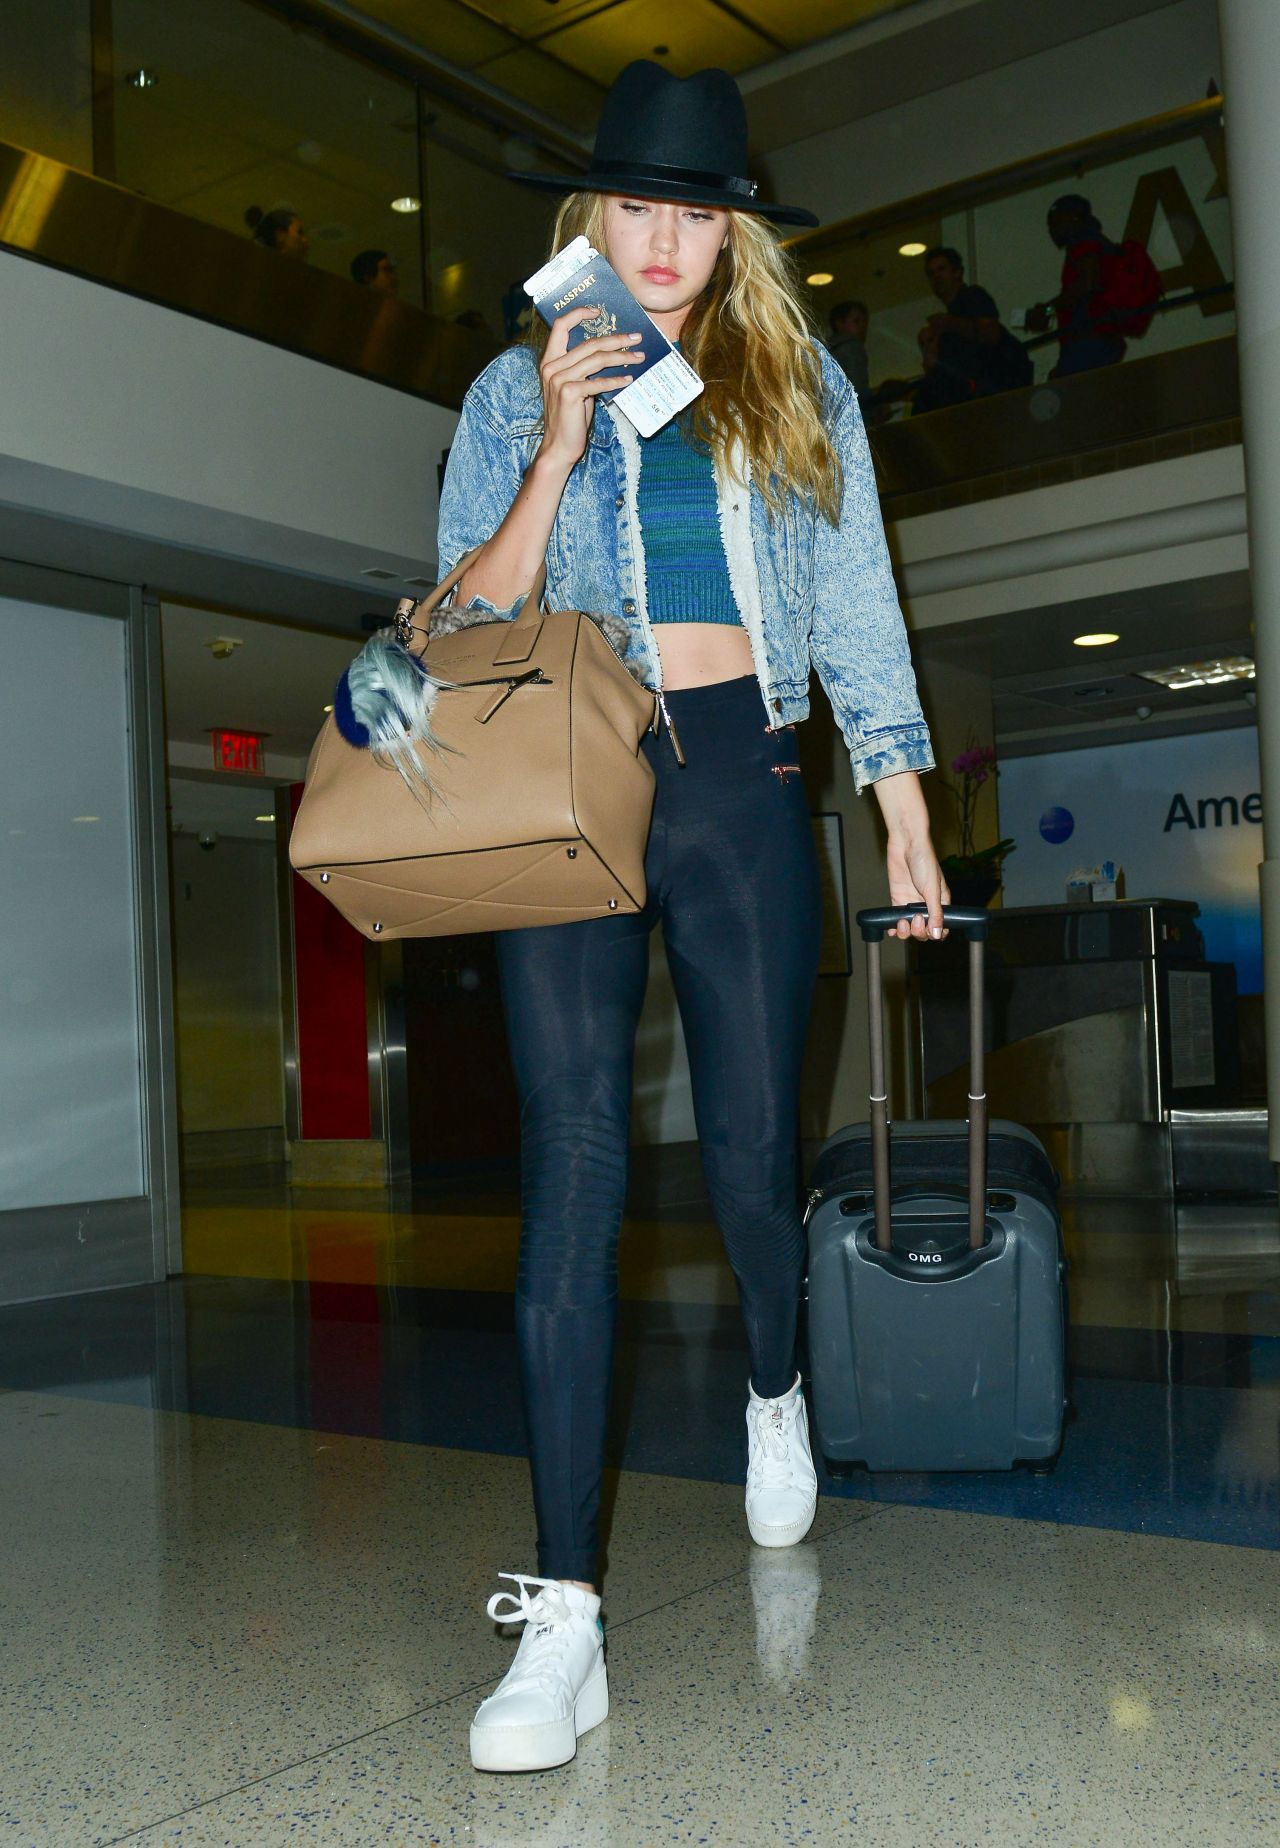 Gigi Hadid at LAX Airport, June 2015